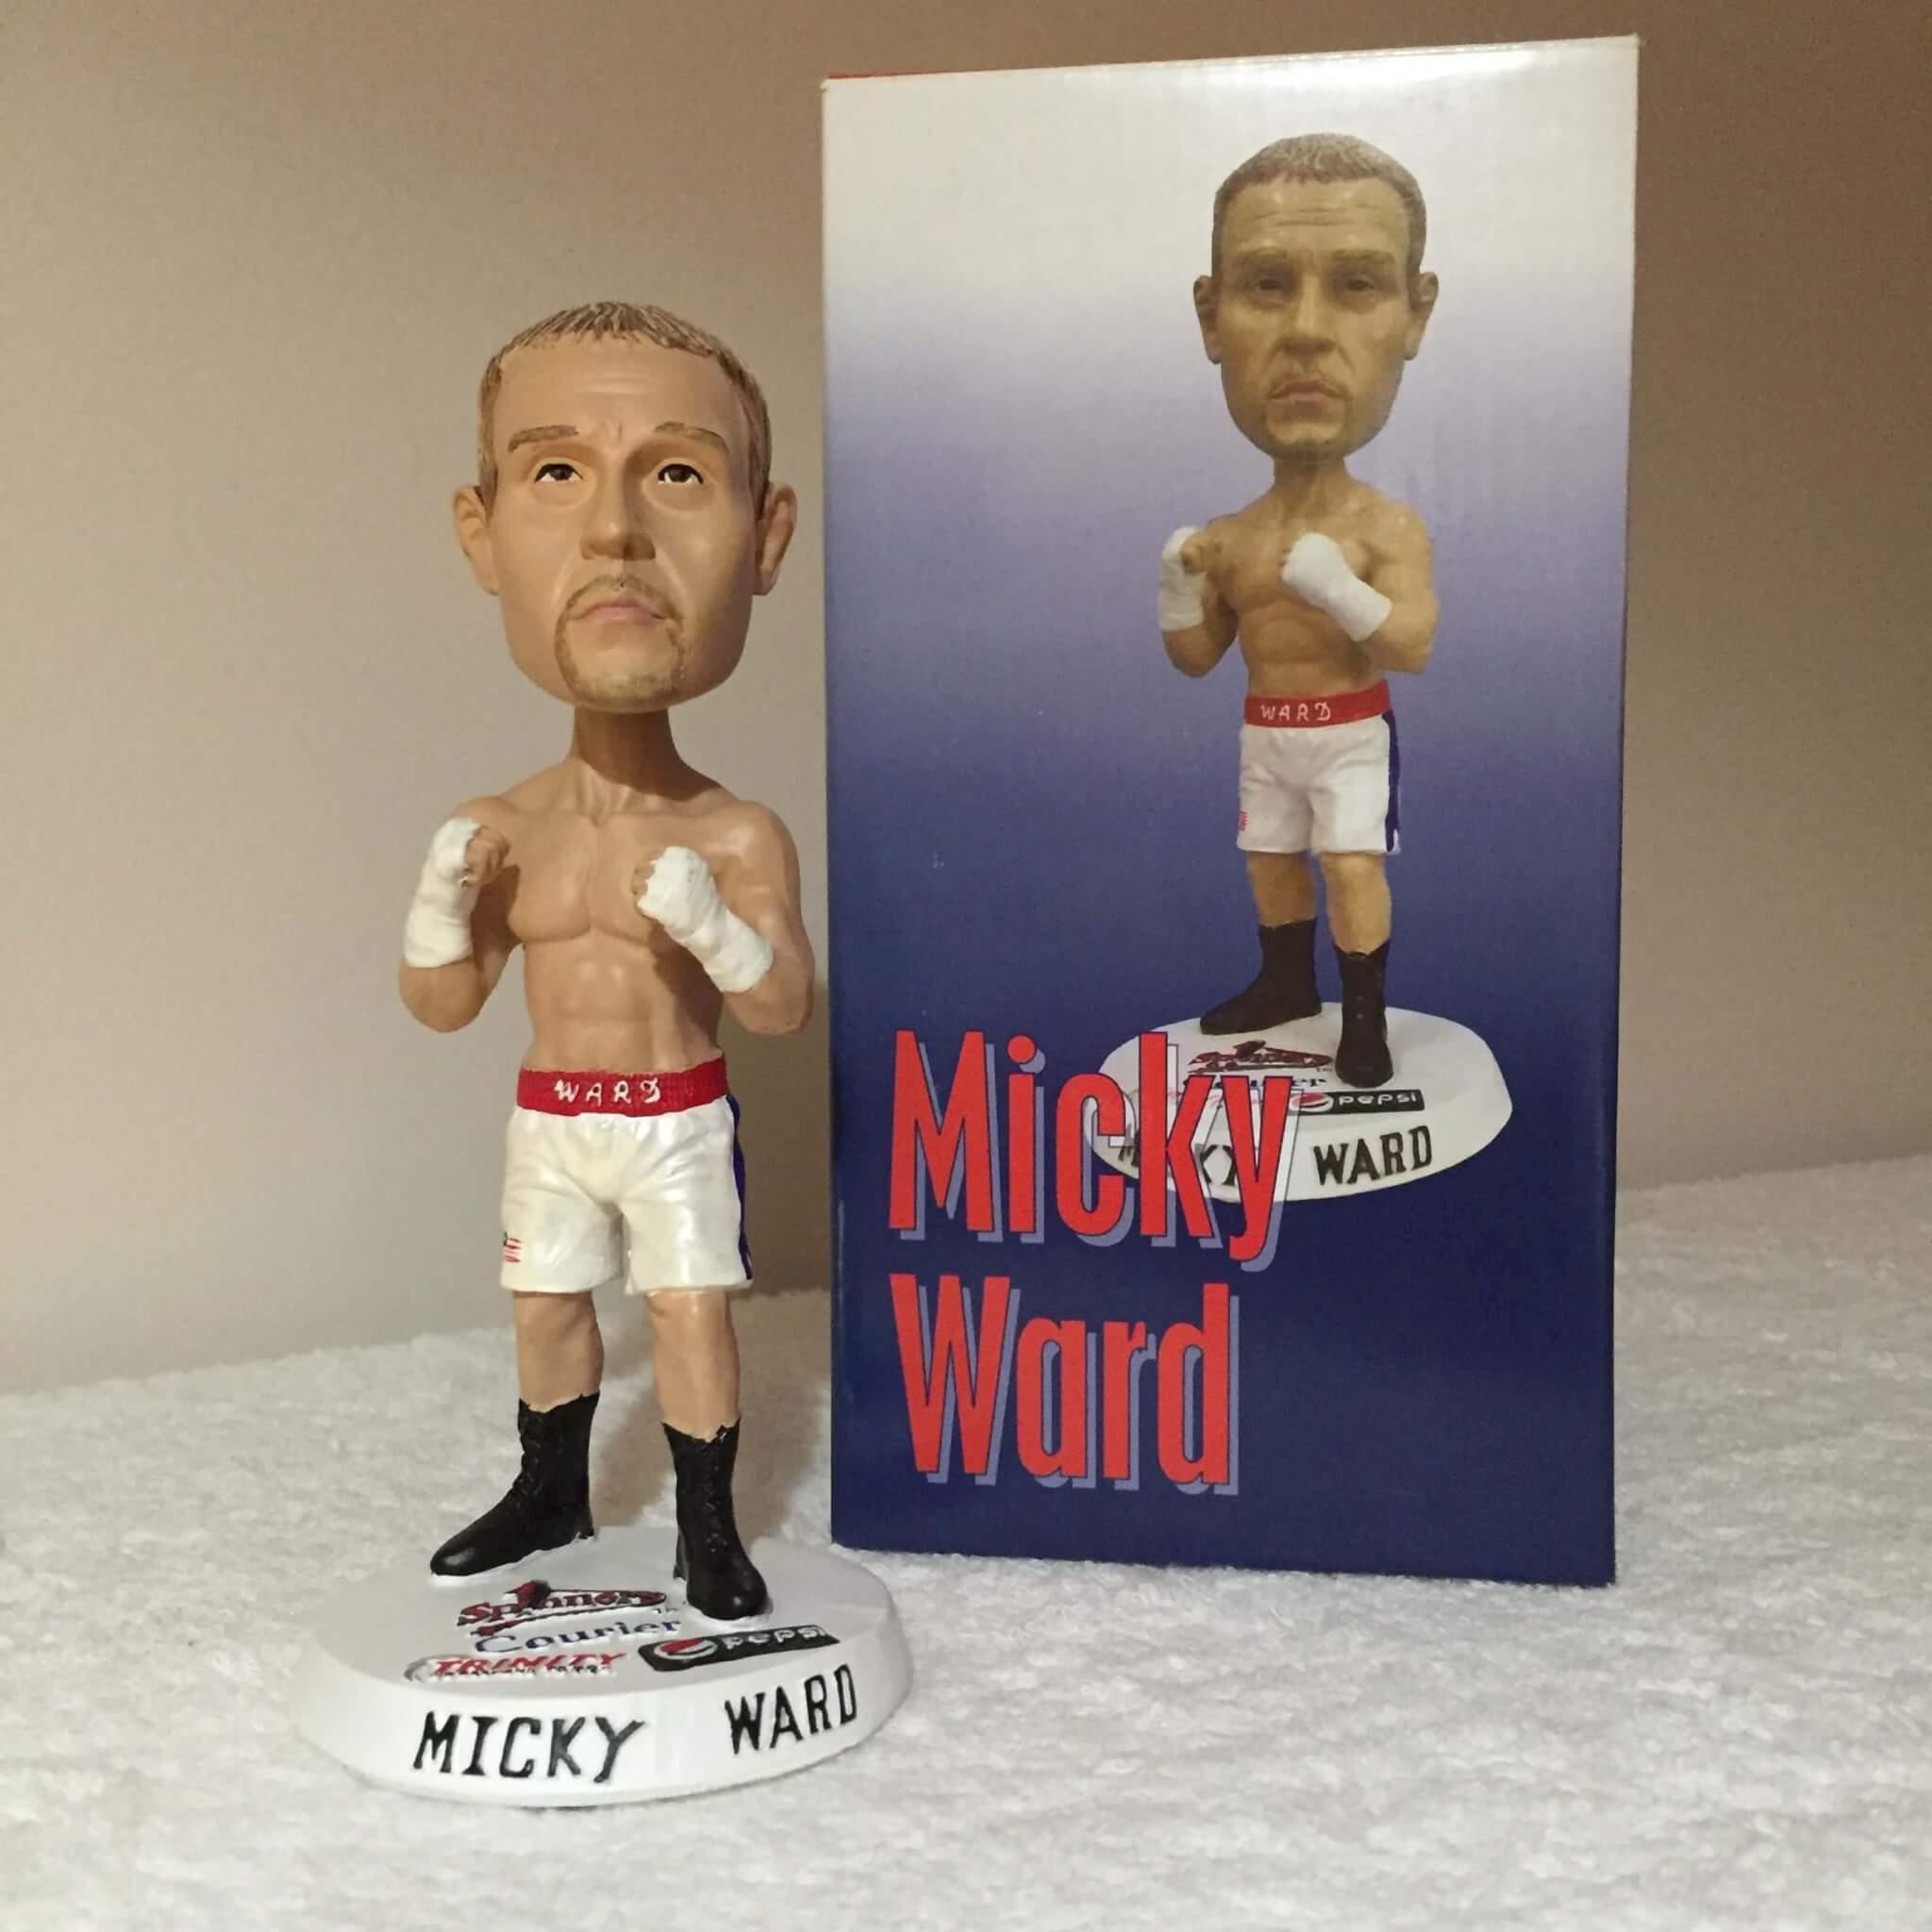 Micky Ward